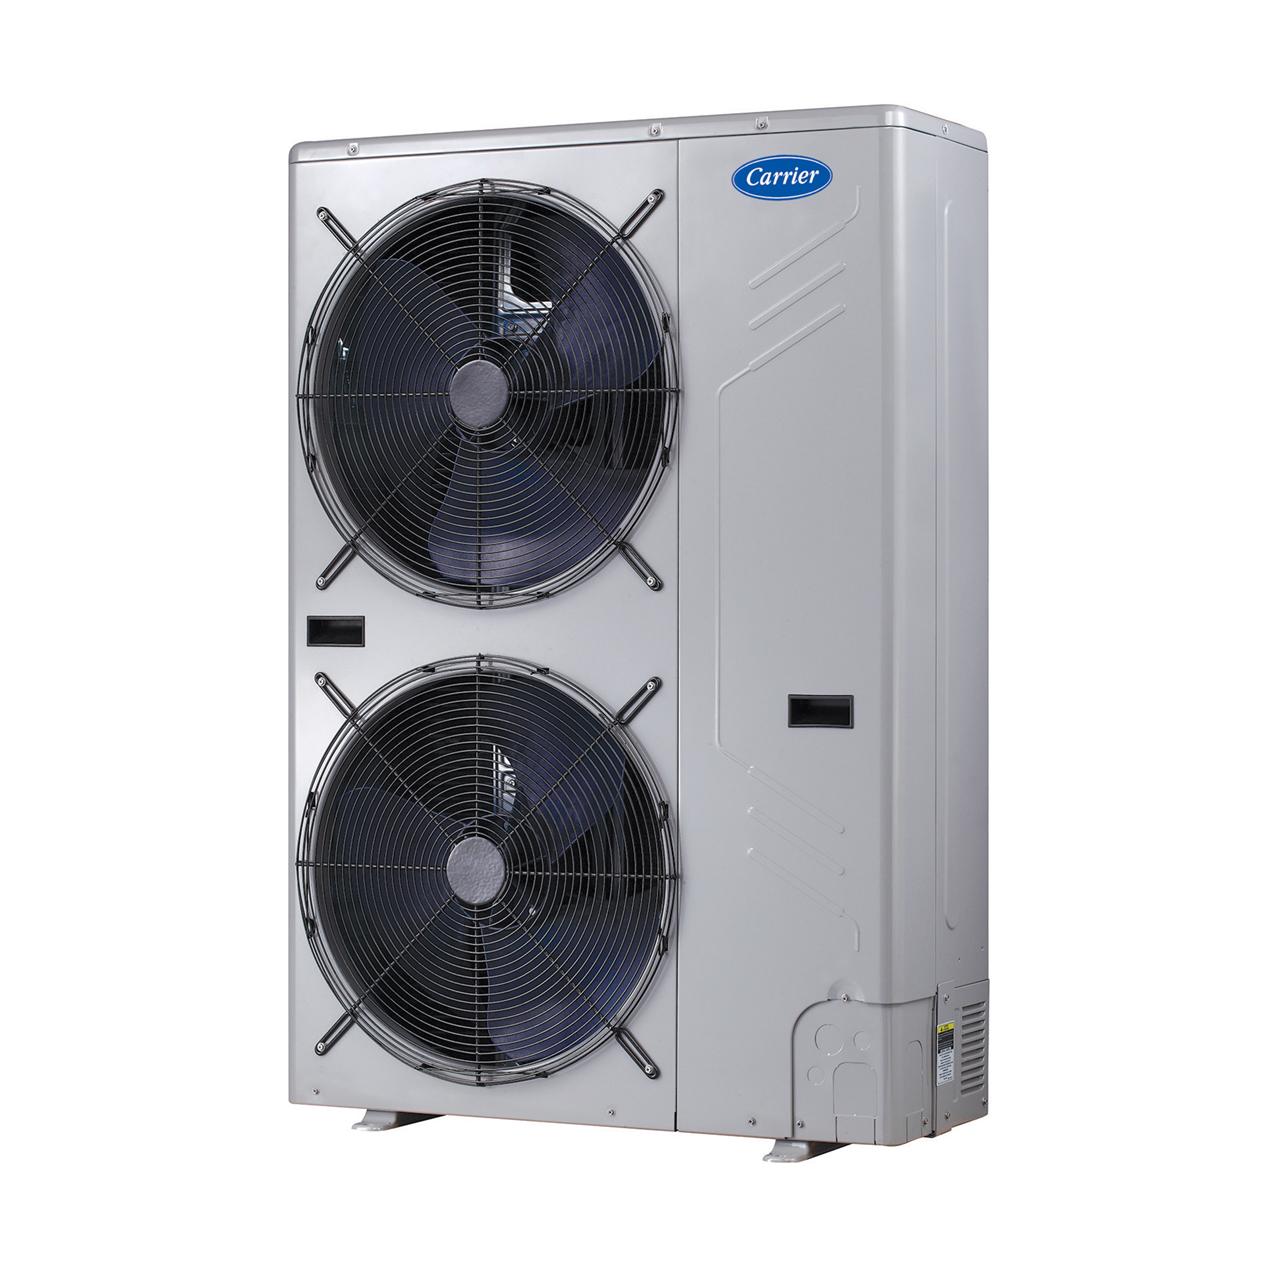 carrier-38vmh-1p-vrf-single-phase-heat-pump-b